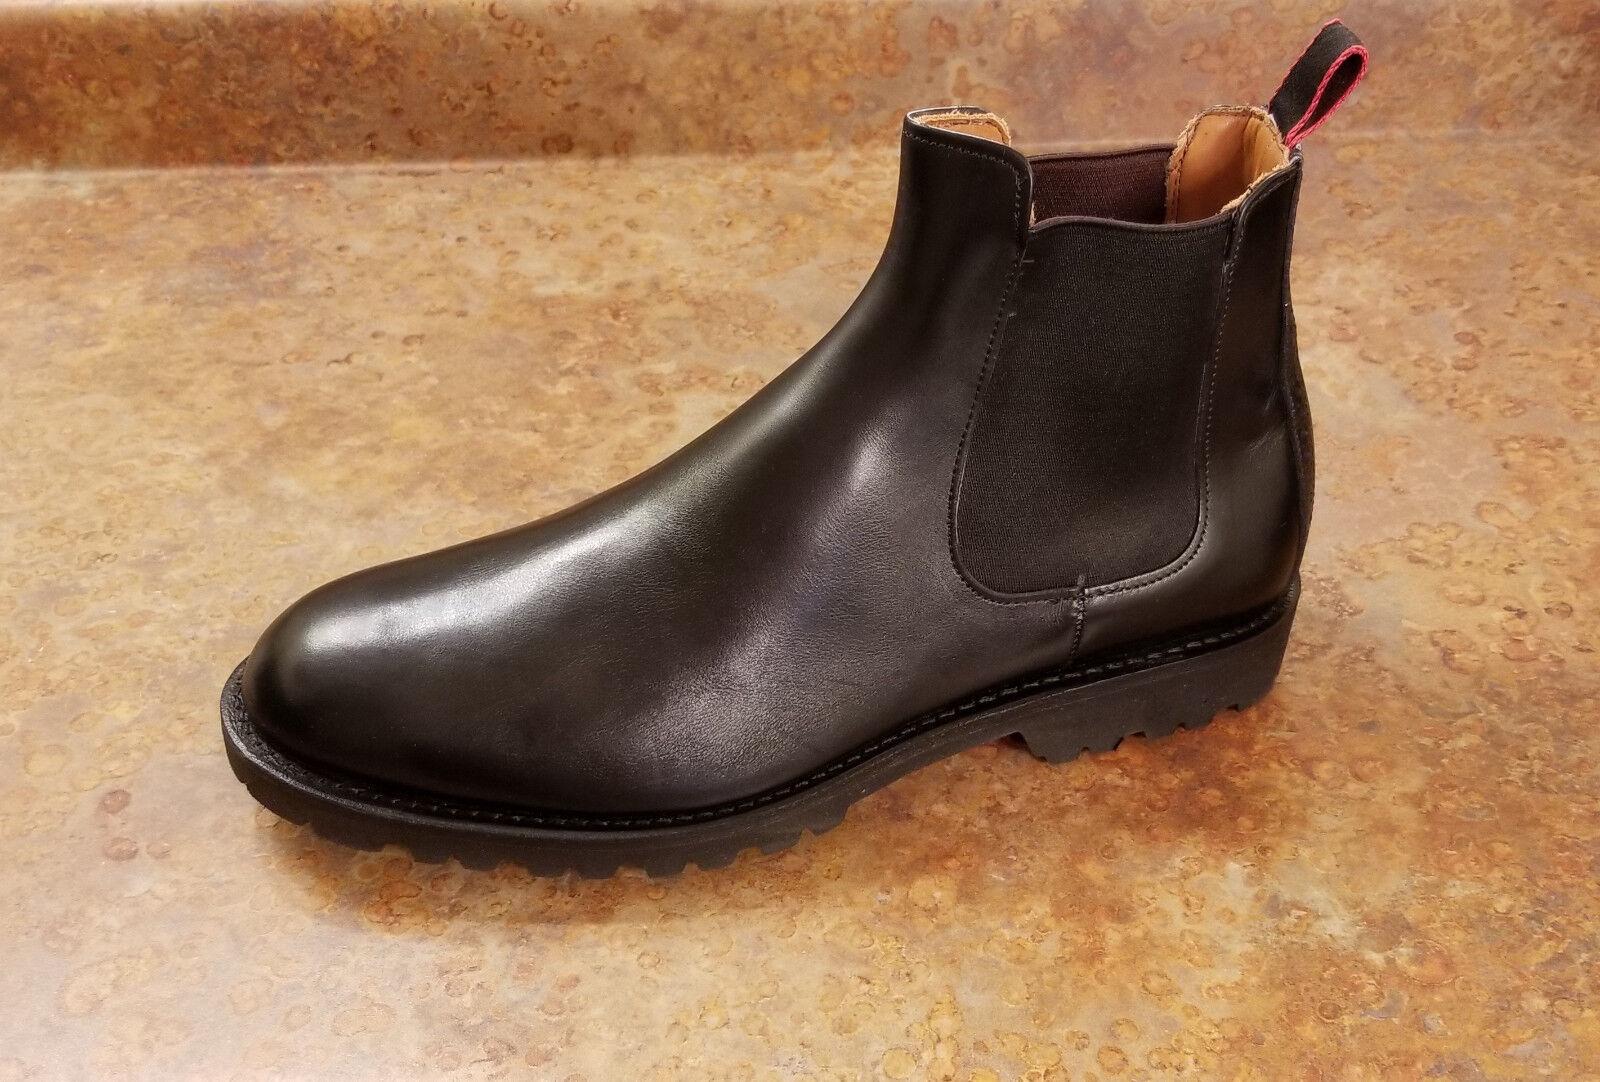 New  Allen Edmonds 'Tate' 'Tate' 'Tate' nero Leather Chelsea stivali Mens 11.5 3E MSRP  345 2593c4